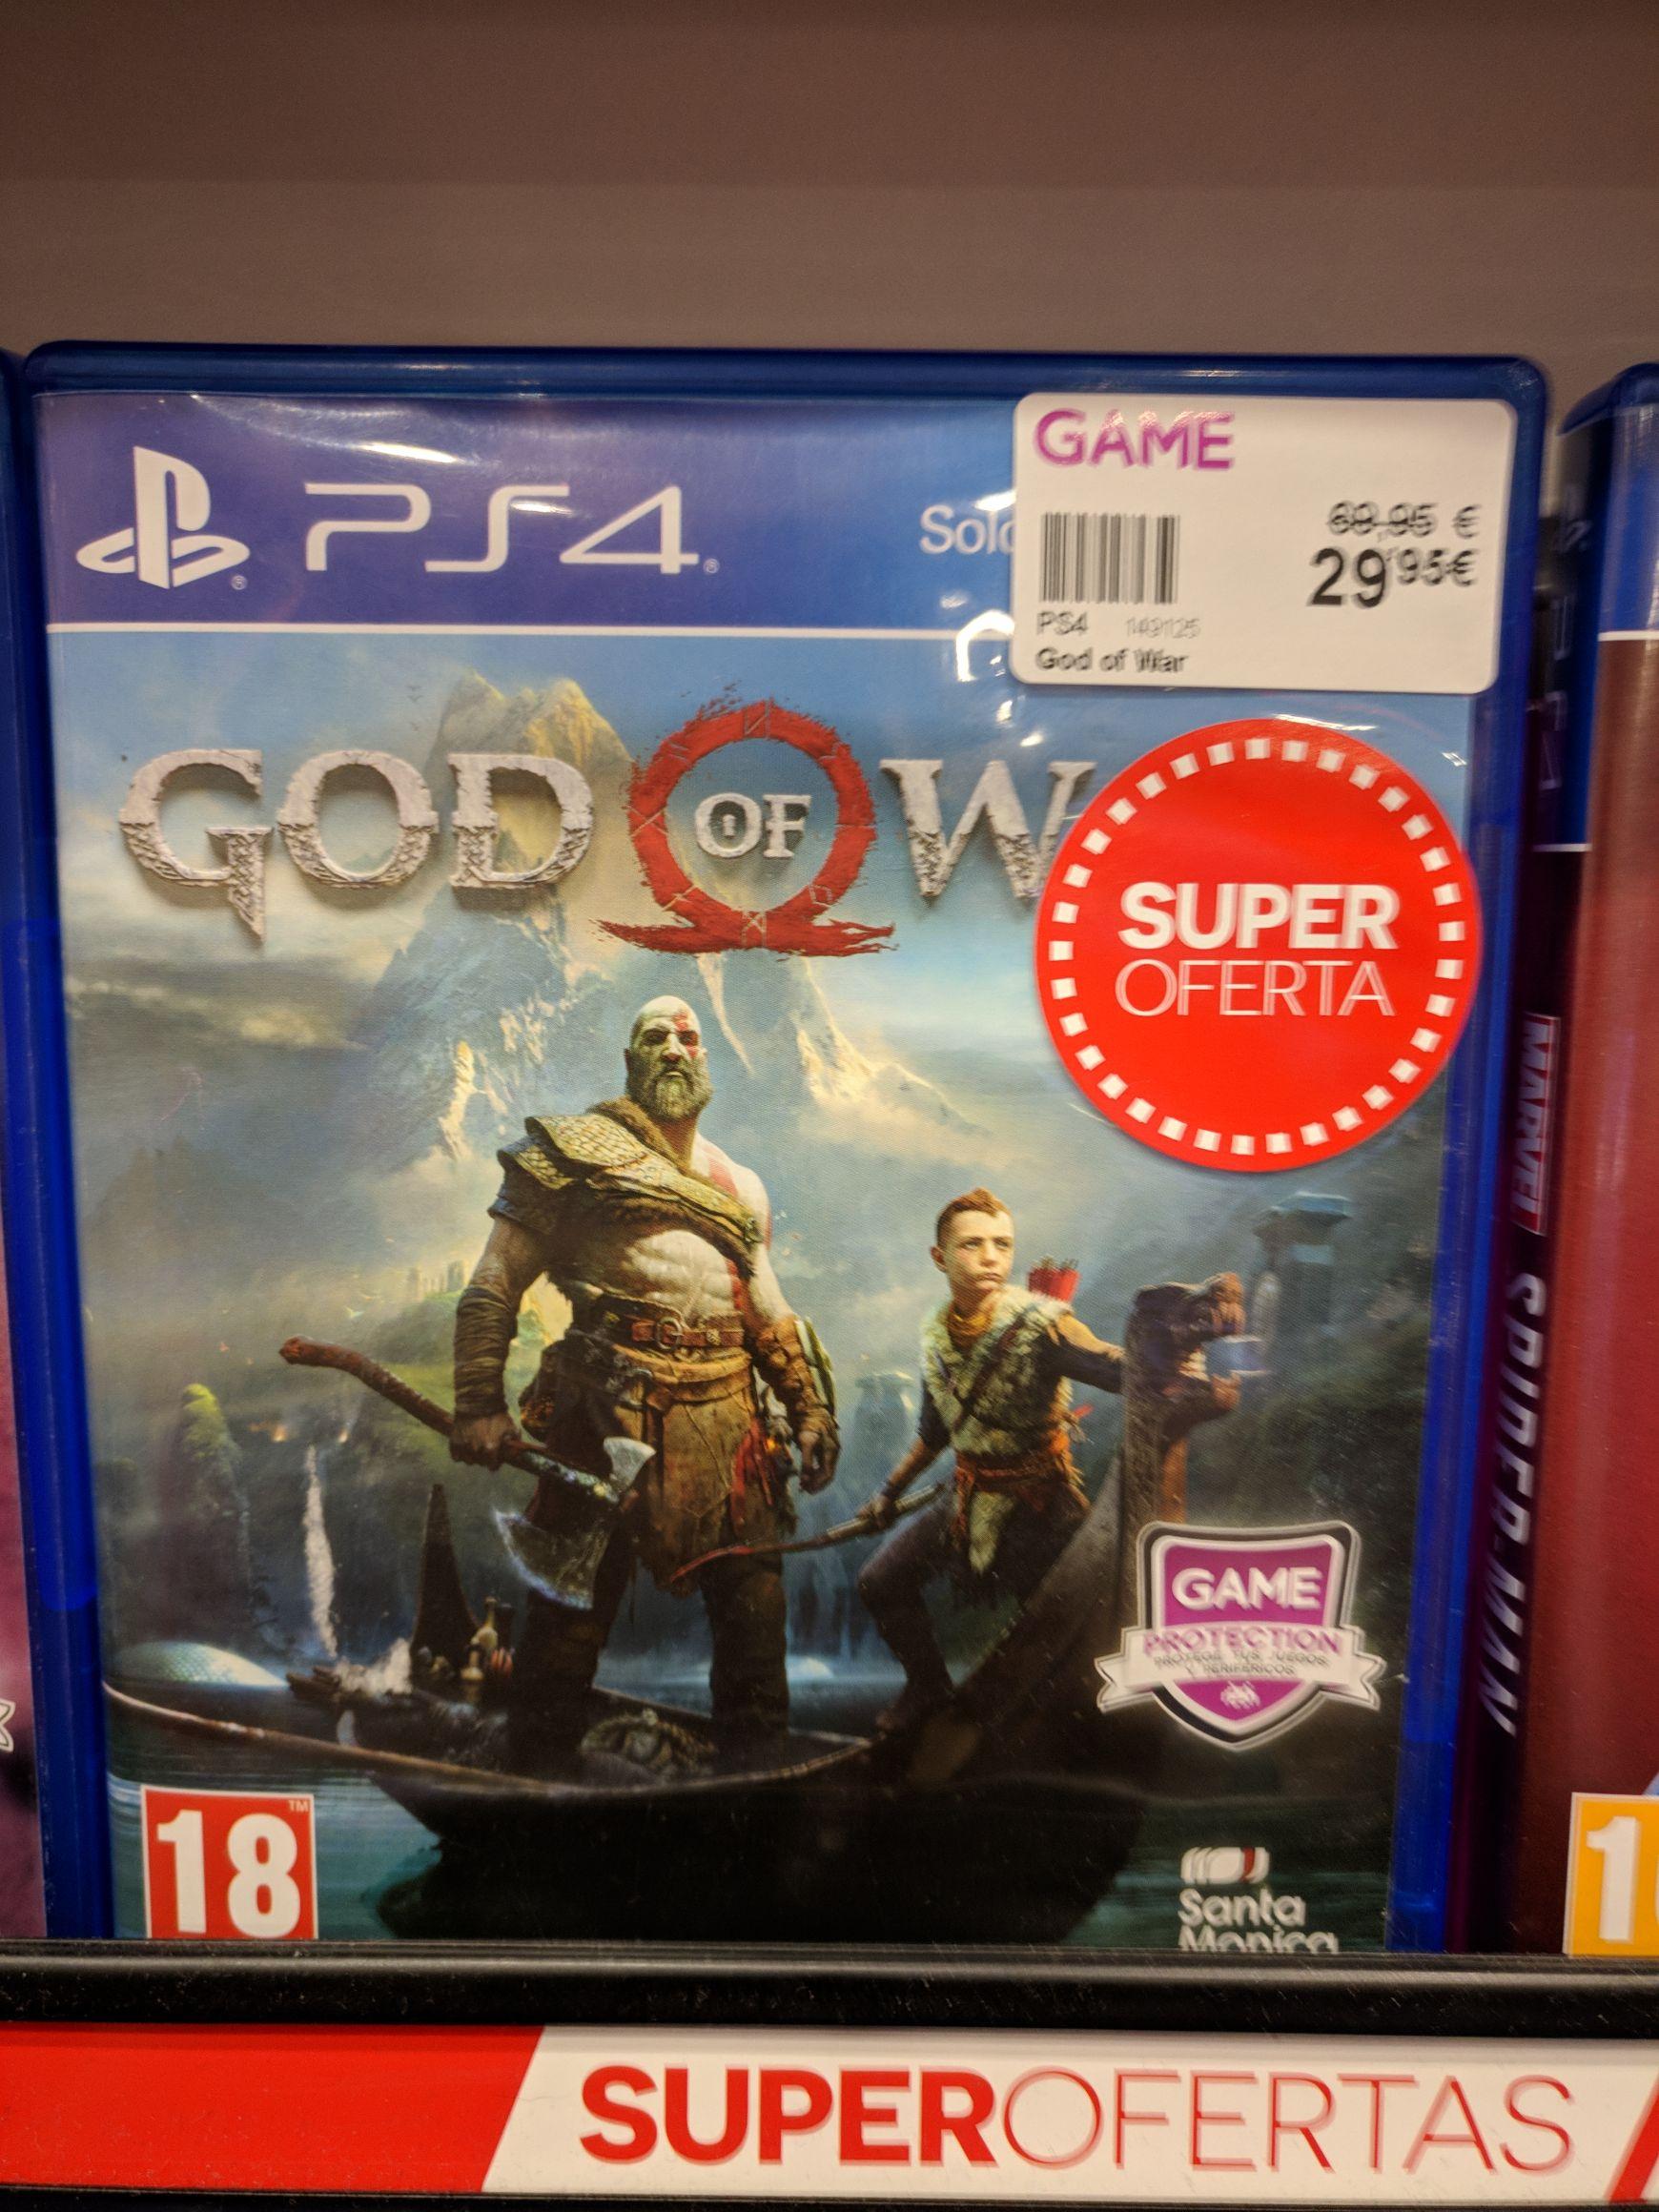 God of War en tiendas Game